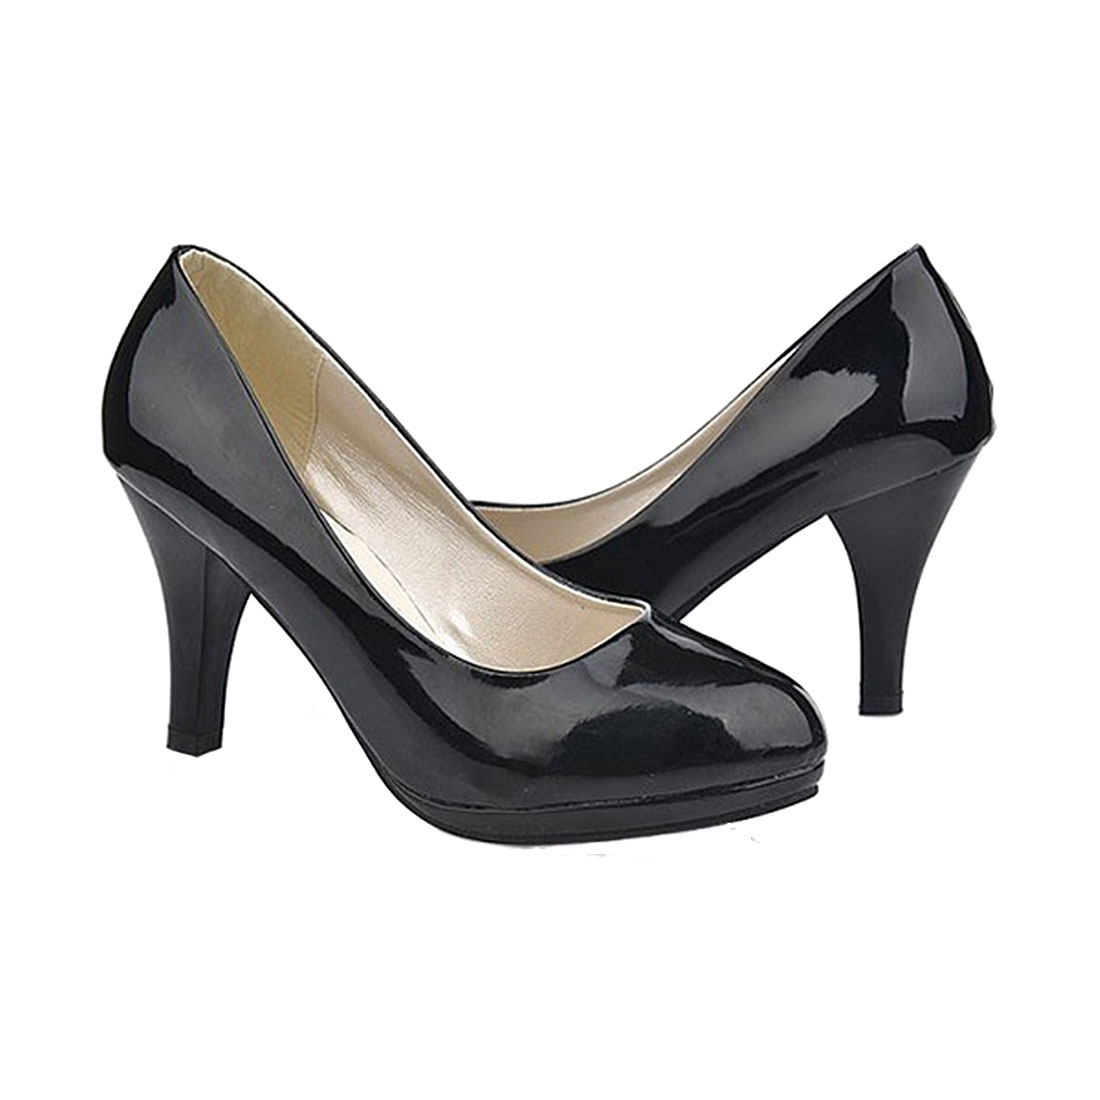 Hot Fashion Classic Sexy office lady round Toe platform low Heels Women wedding Pumps Shoes Black plus size